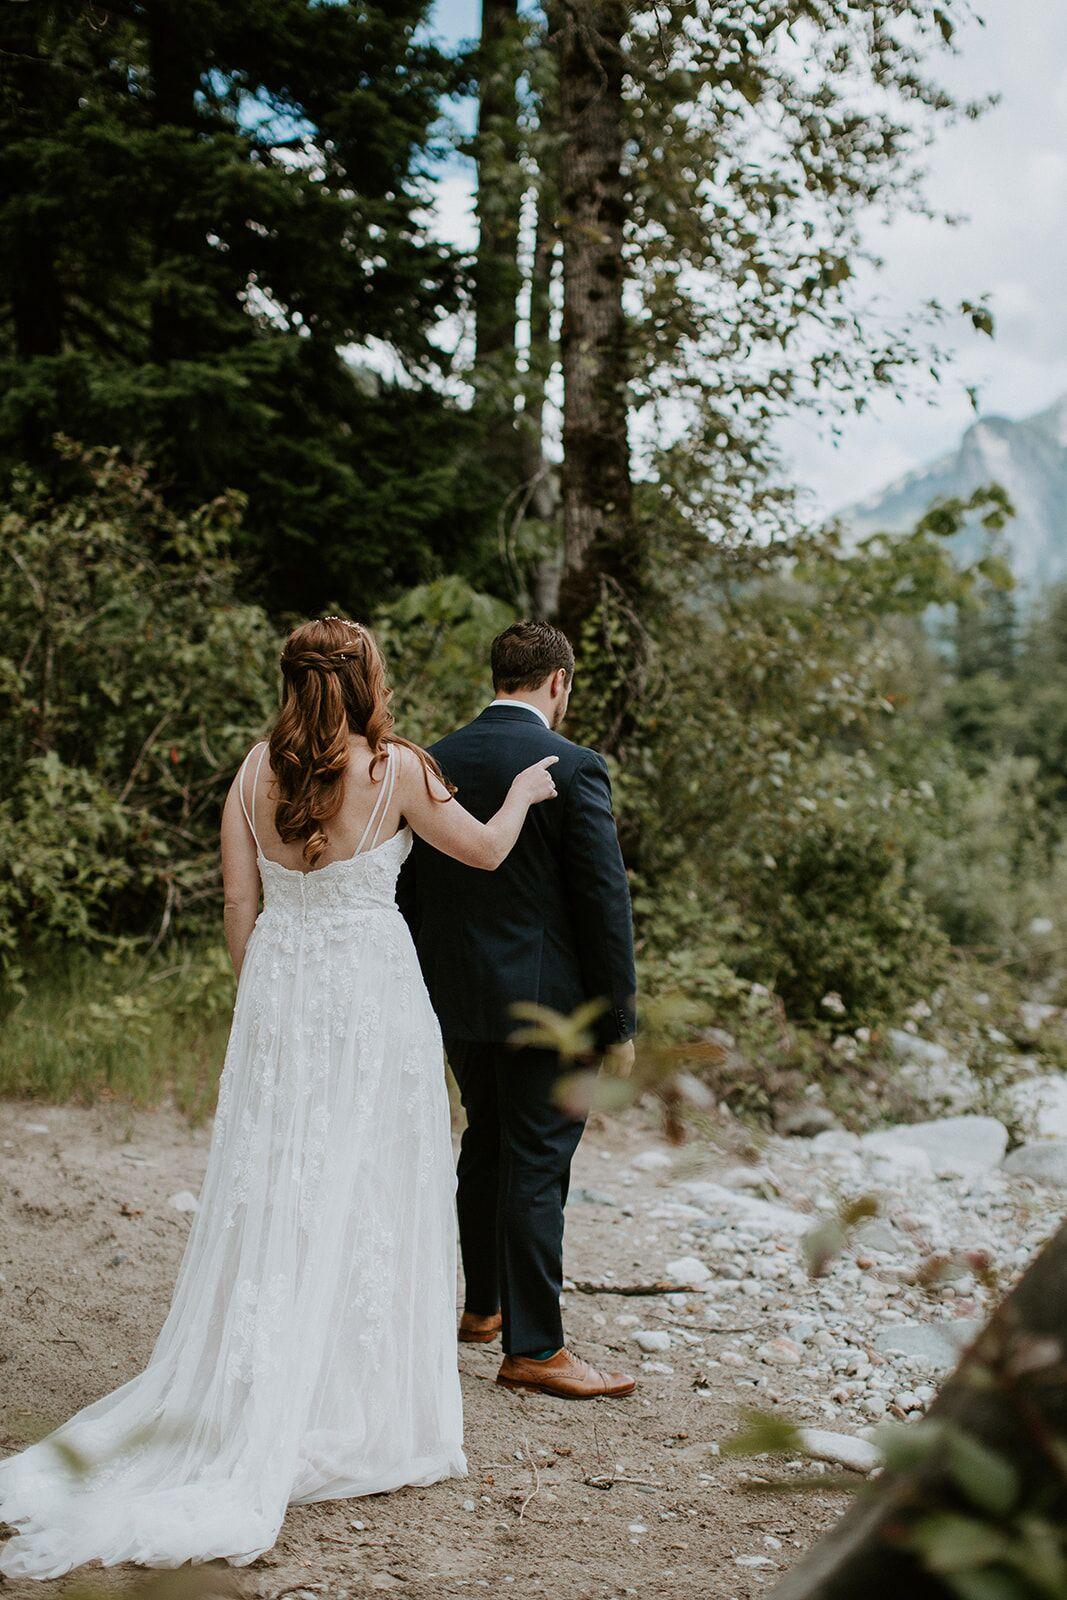 Blue-Sky-Ranch-Wedding-Block-Weddings-and-Events8.jpeg